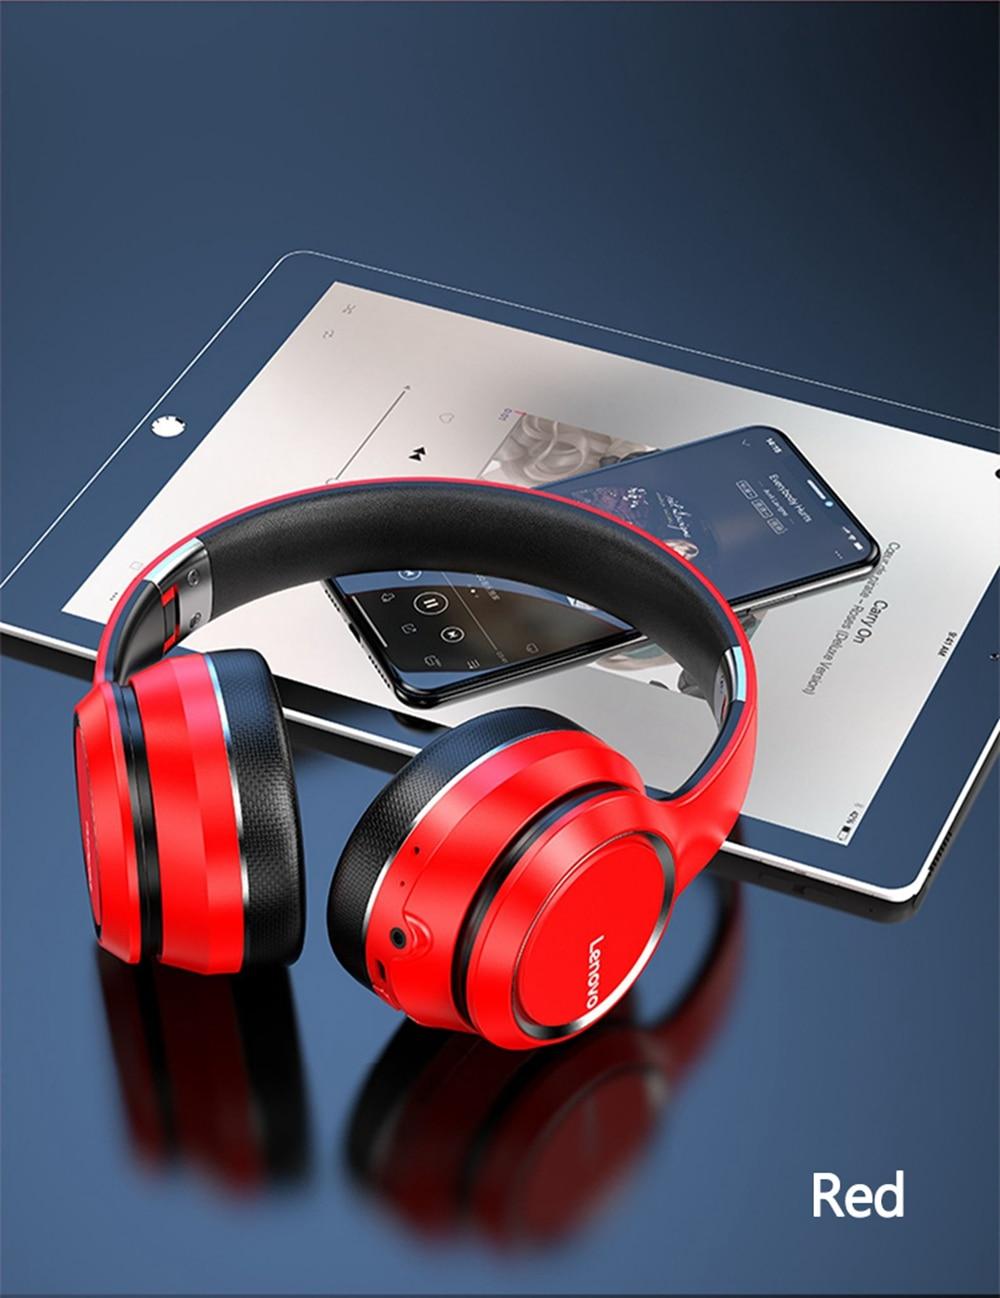 Lenovo HD200 Bluetooth Draadloze Stereo Hoofdtelefoon BT5.0 Lange Standby Leven Met Noise Cancelling Voor Xiaomi Iphone Lenovo Headset 20